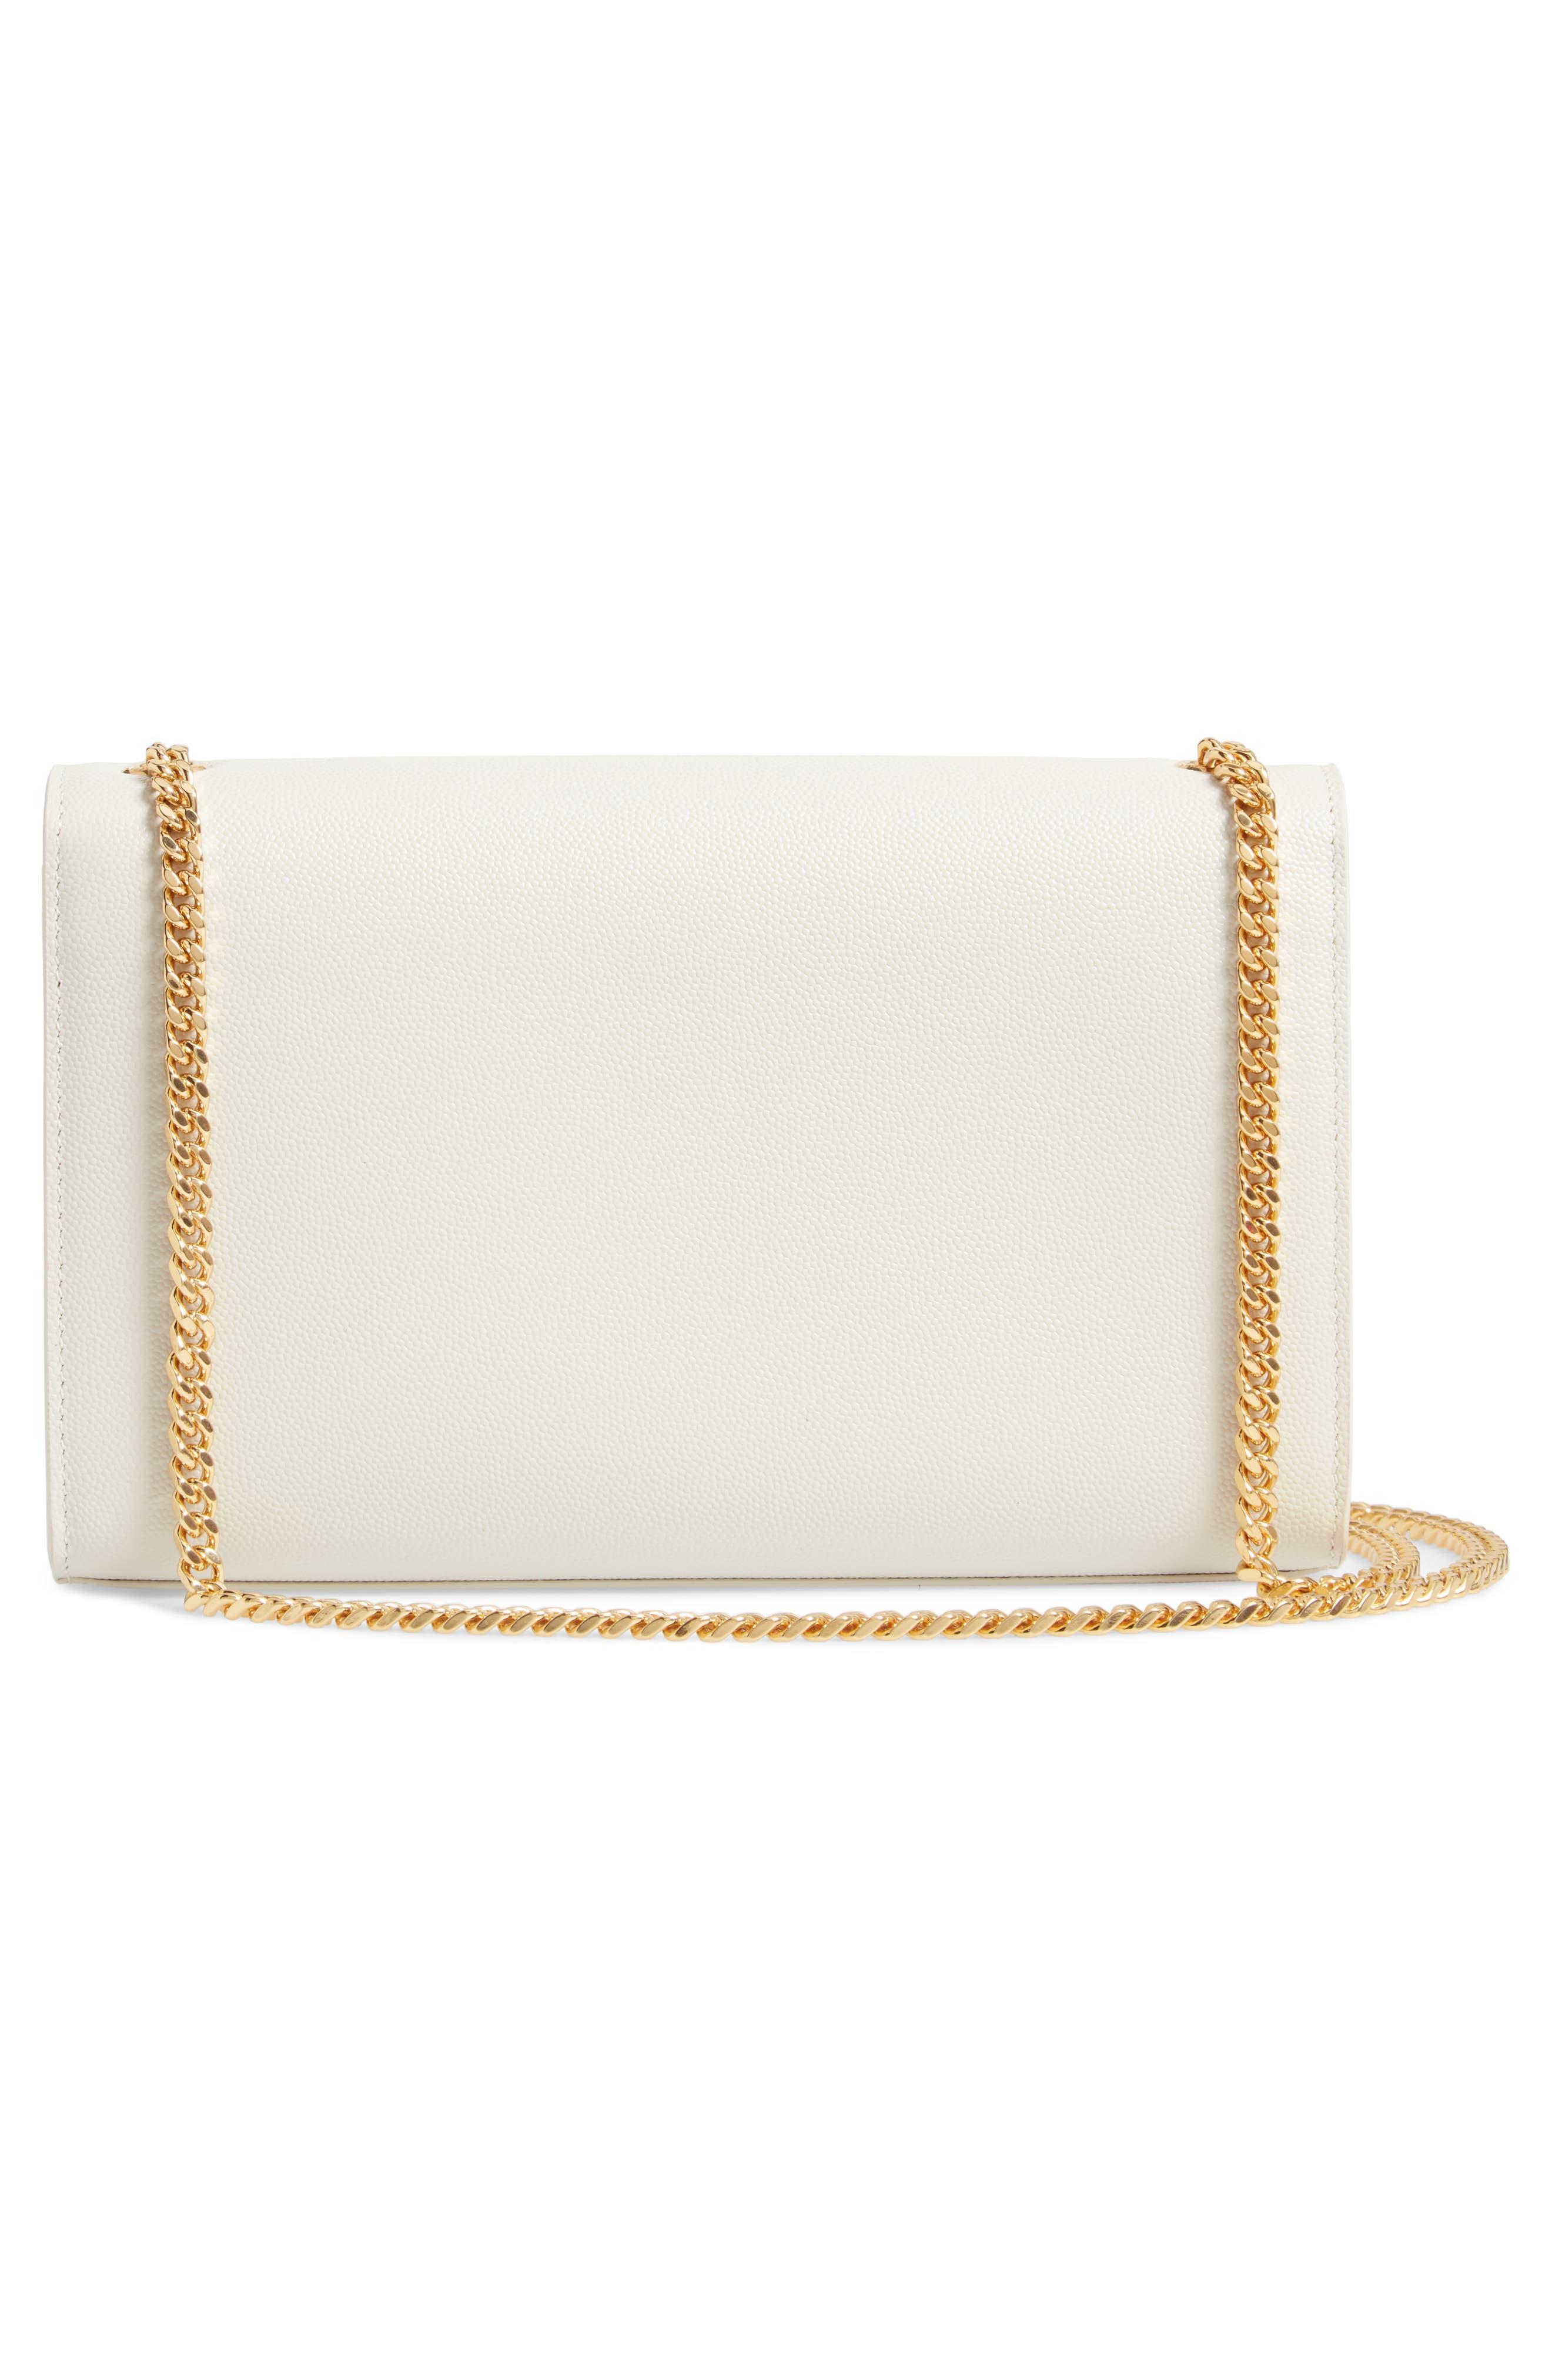 'Medium Kate' Leather Chain Shoulder Bag,                             Alternate thumbnail 3, color,                             CREMASOFT